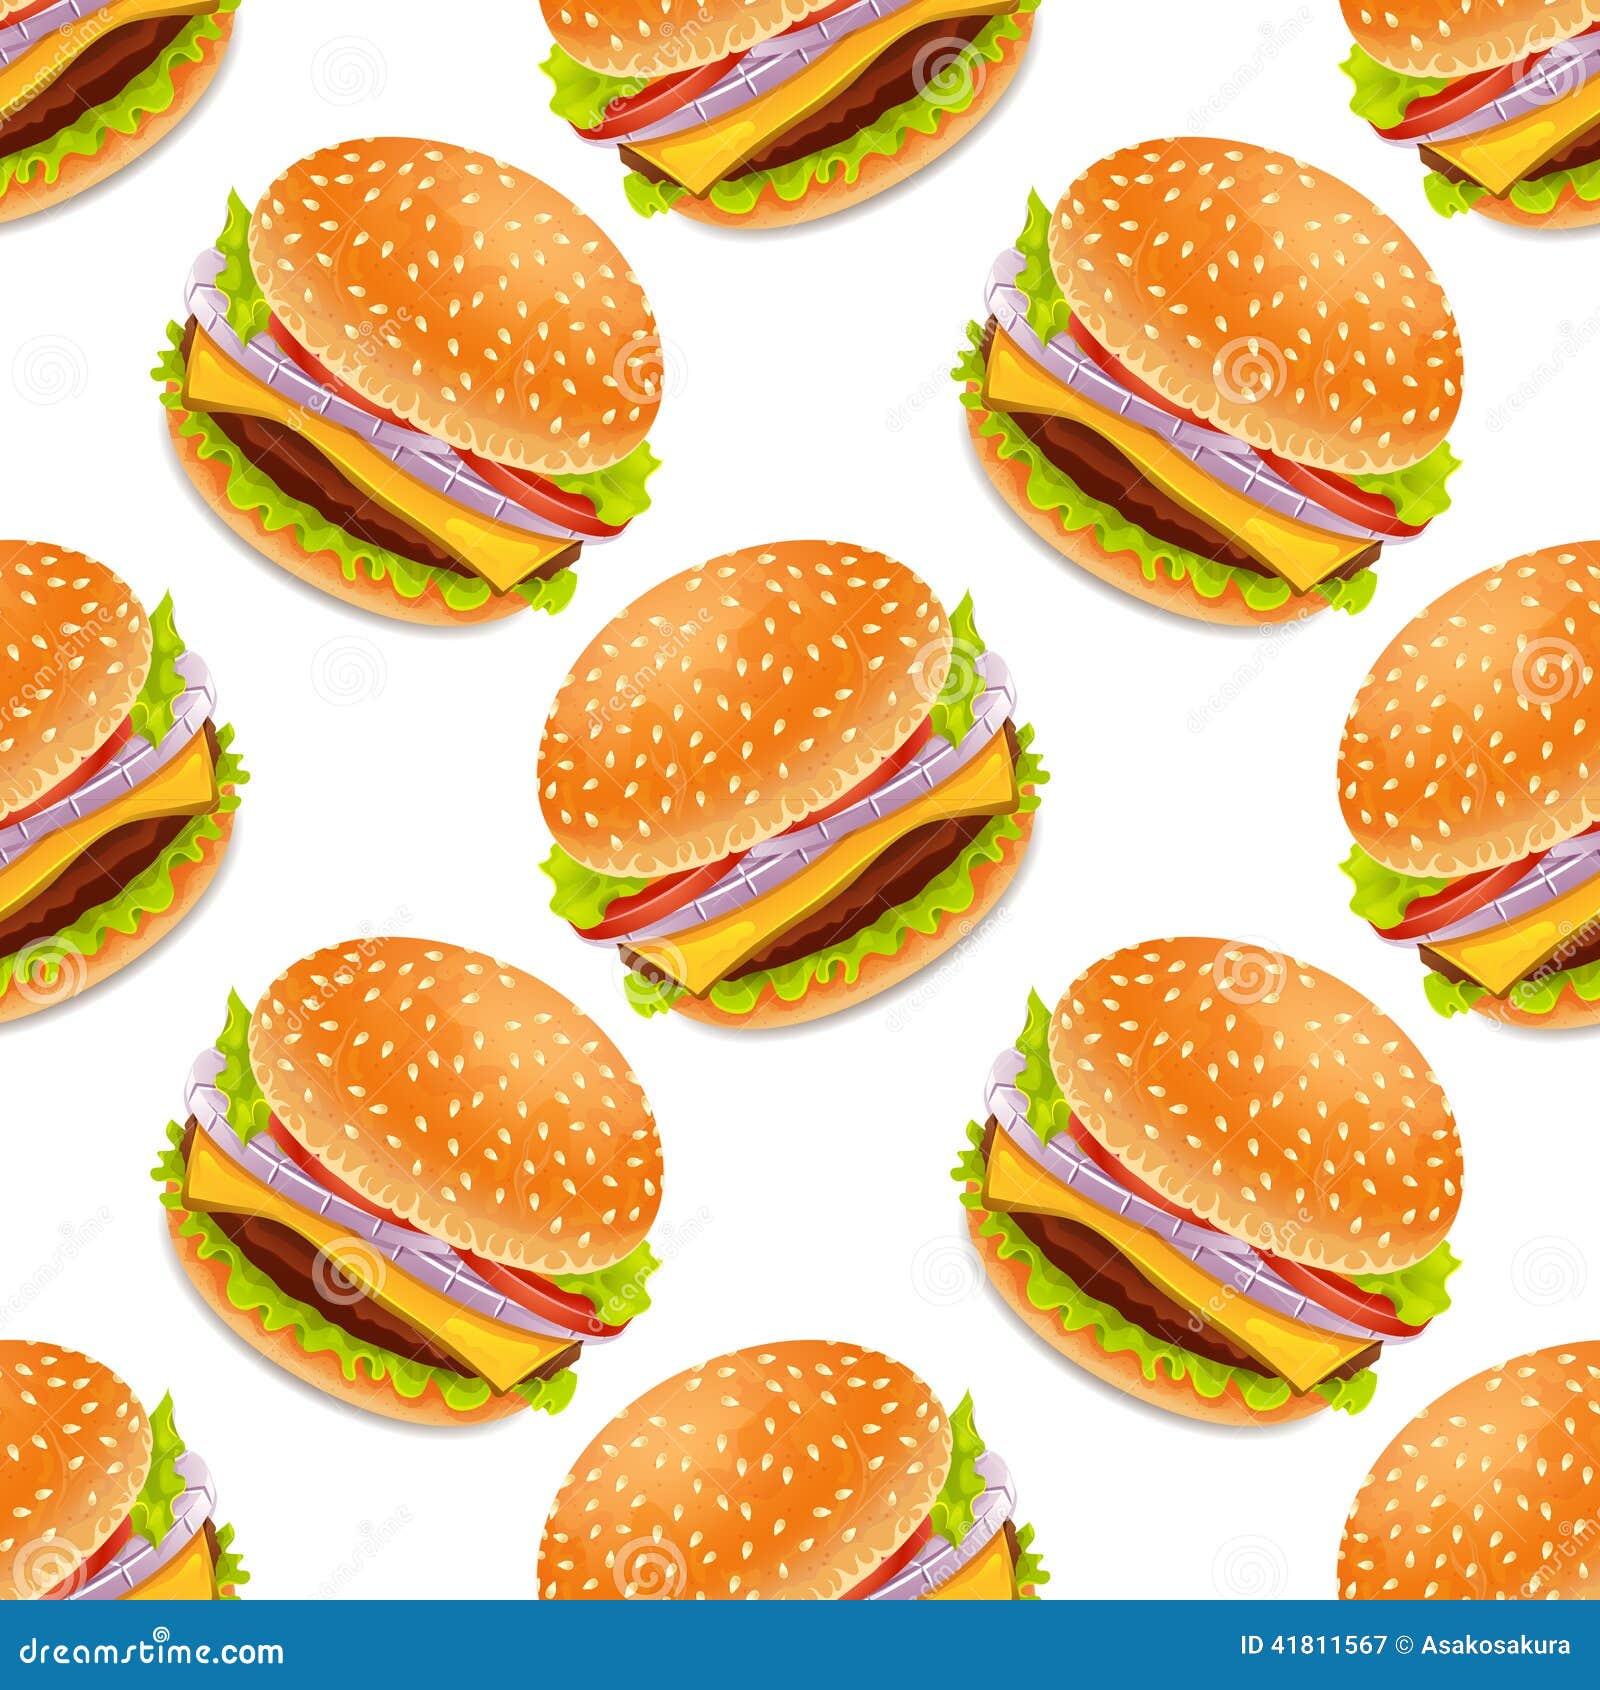 cartoon hamburger wallpaper - photo #6